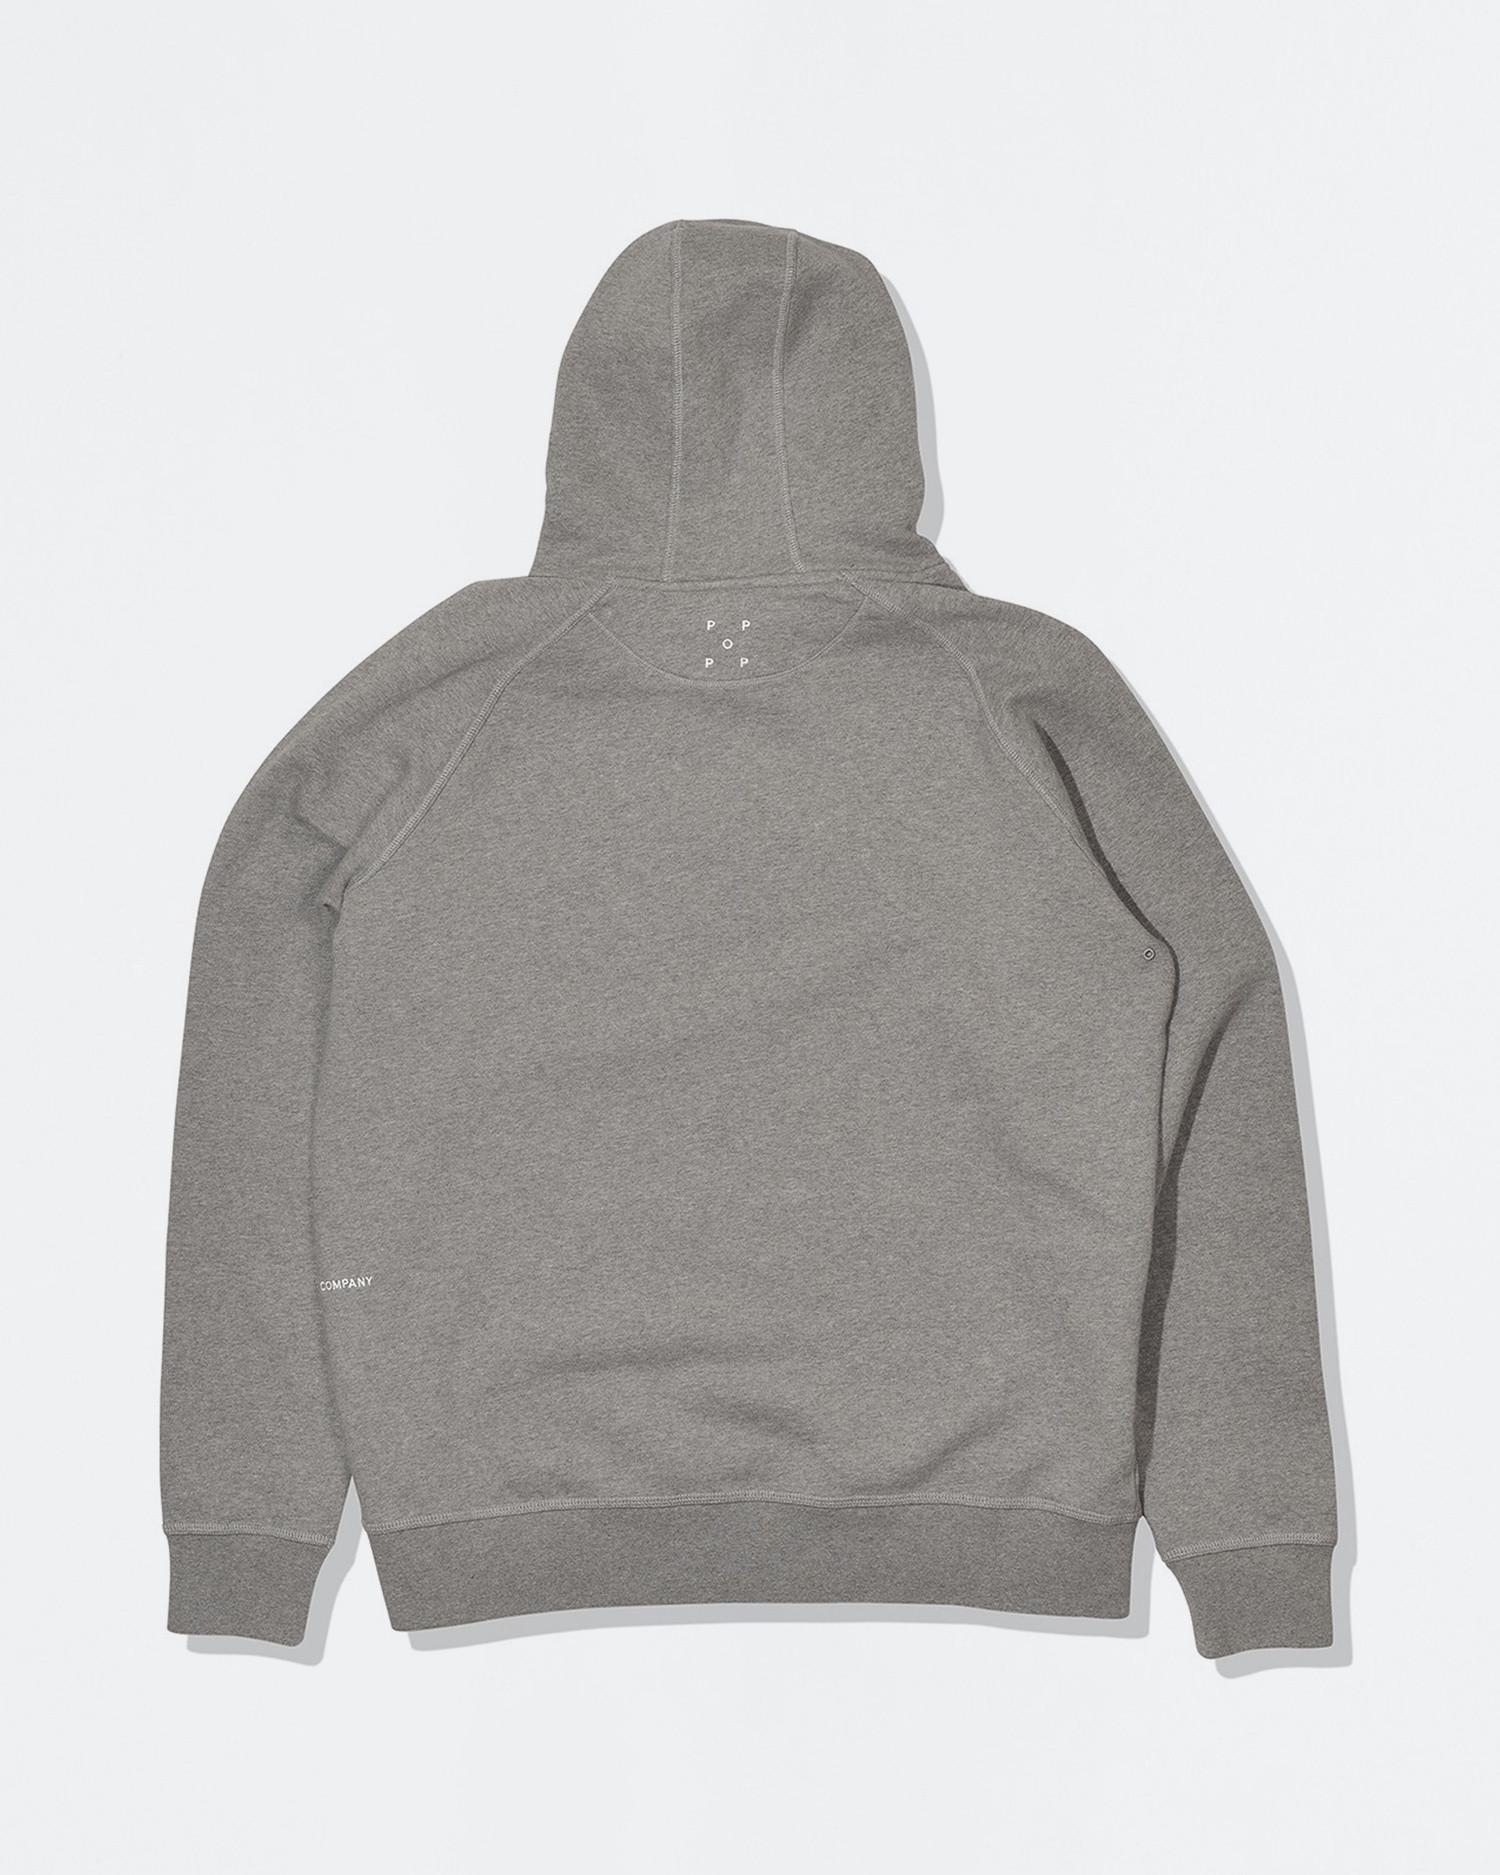 Pop Trading Co X Popeye hoodie heather grey